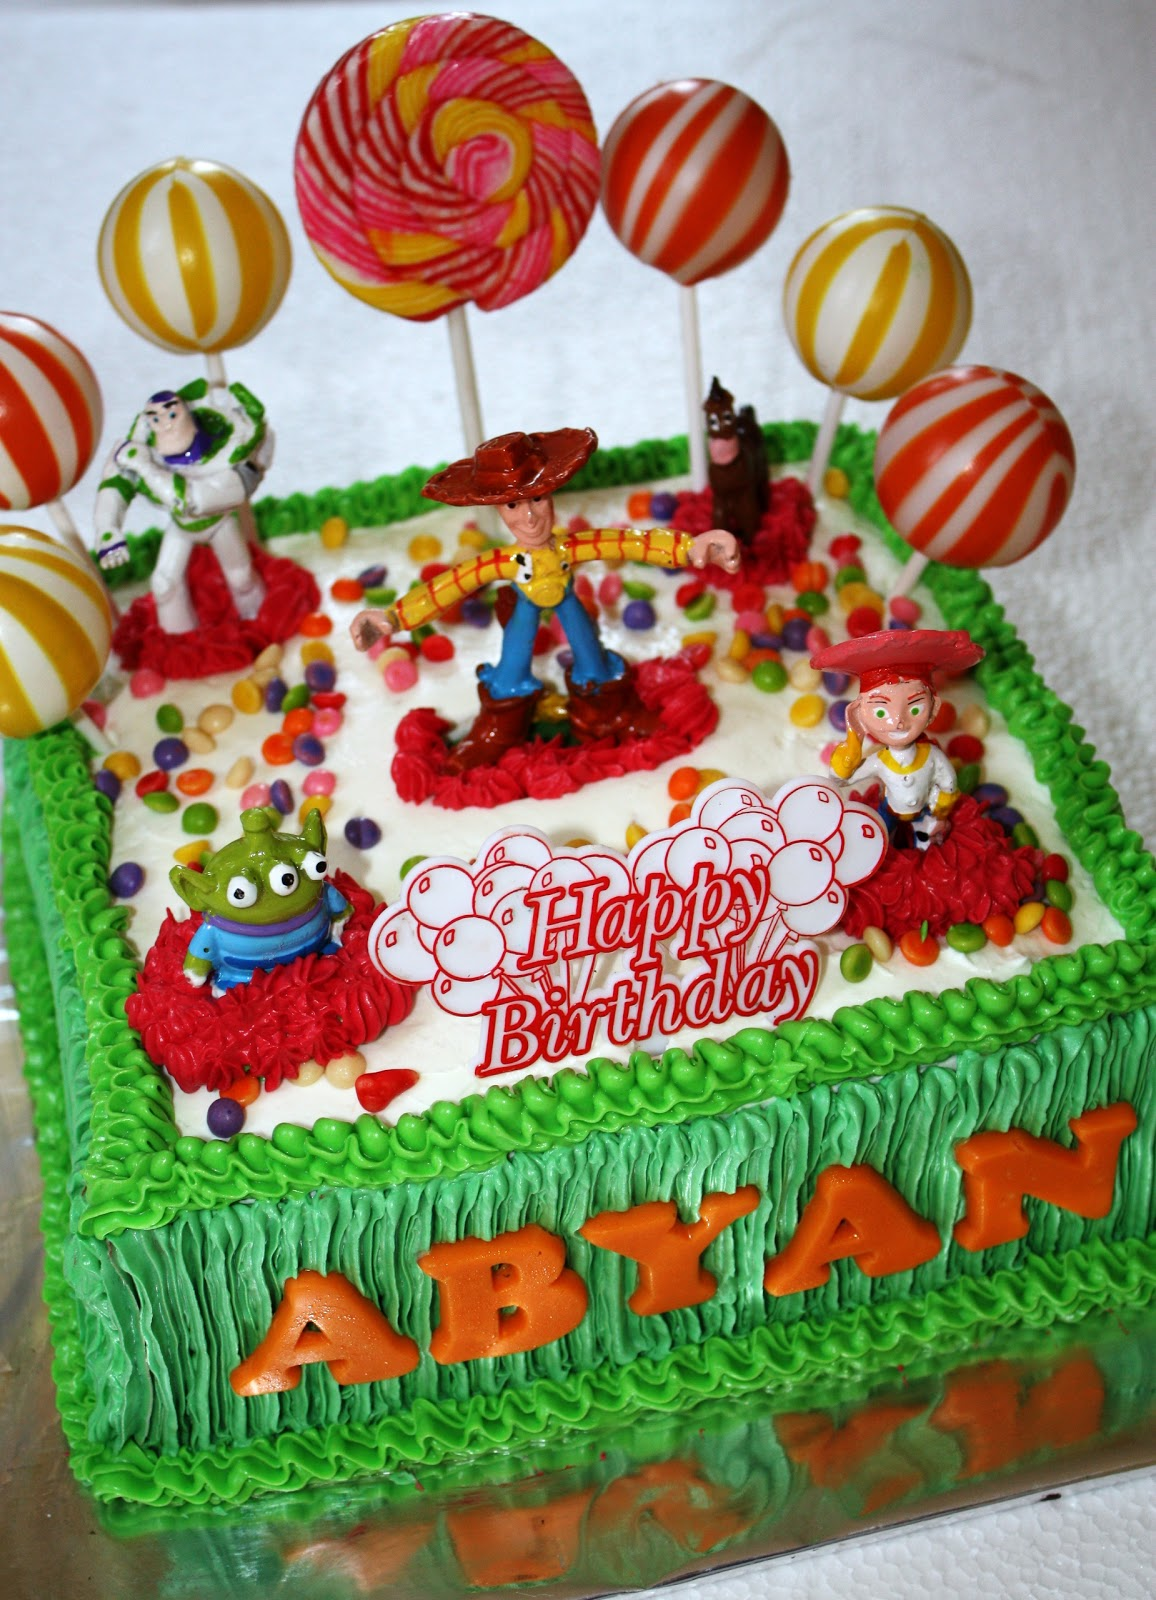 Gambar Kue Ulang Tahun Buat Mantan